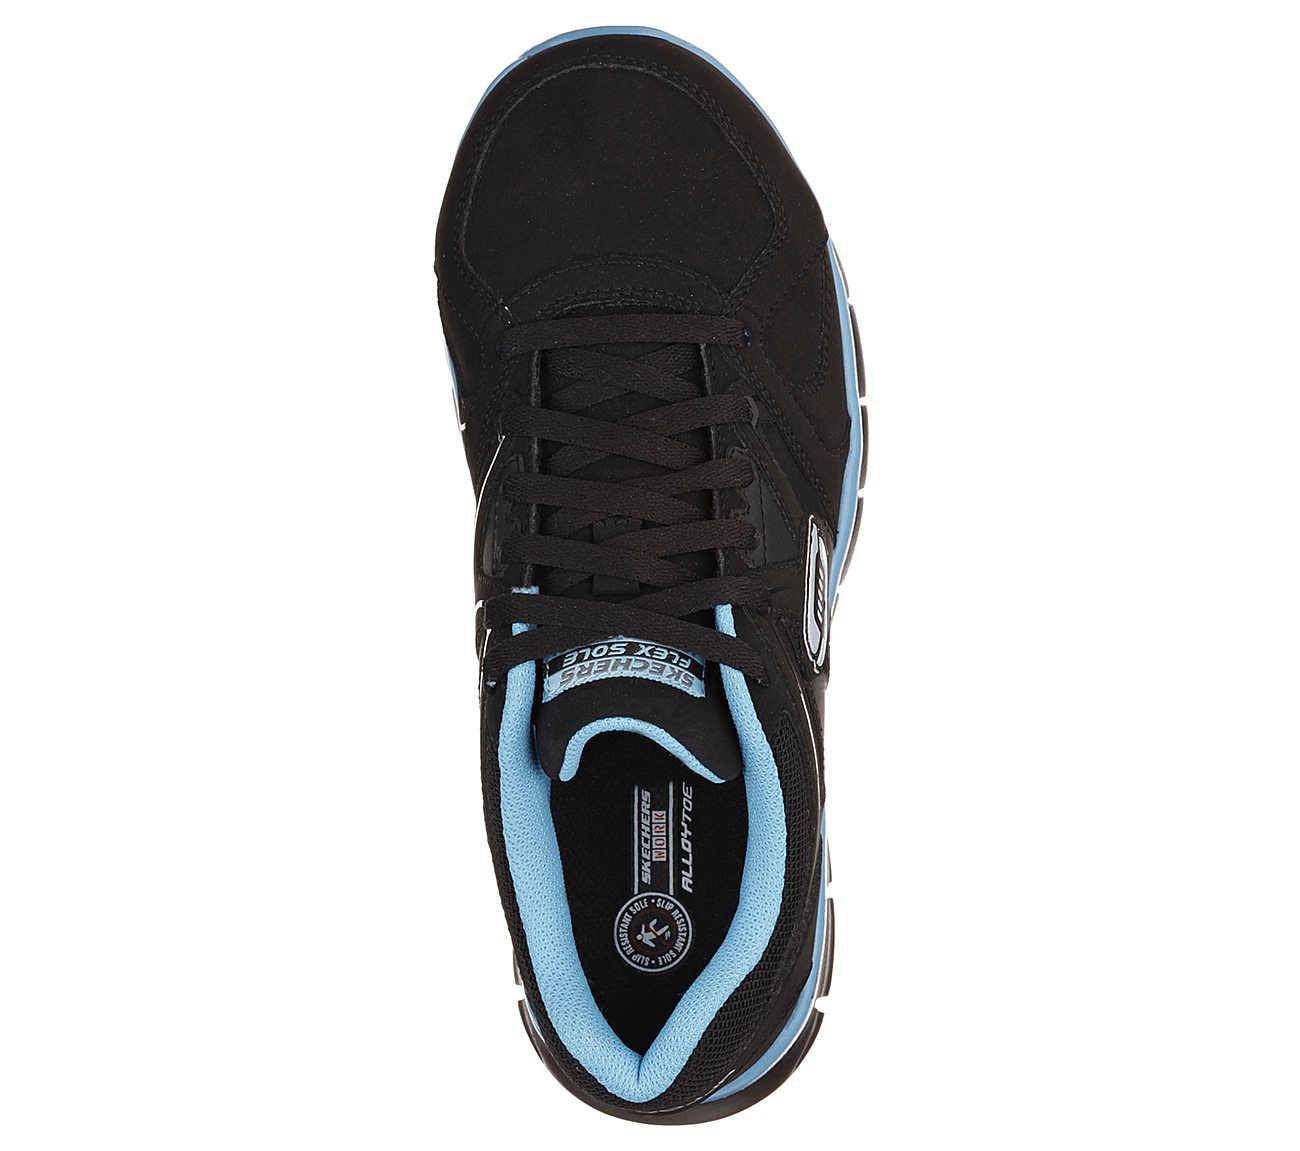 work shoes las vegas nevada style guru fashion glitz